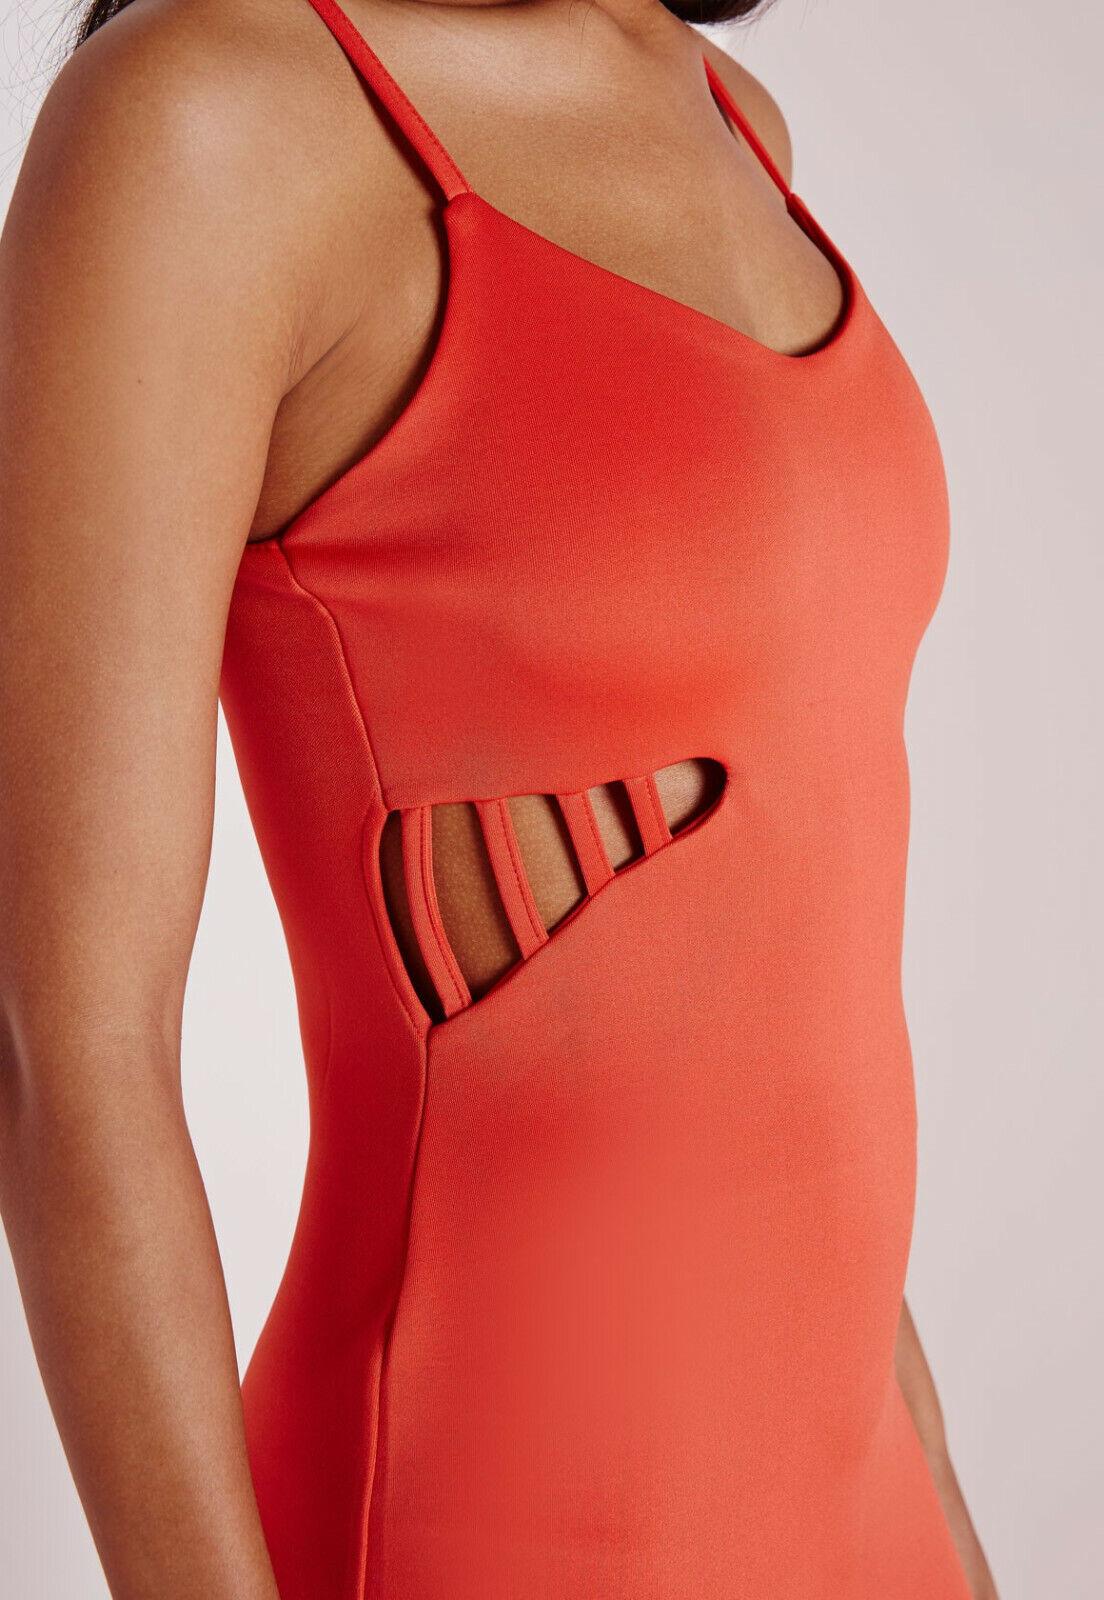 Missguided orange Strappy Stretch Bodycon Cut Out Mini Dress Size 16 BNWT